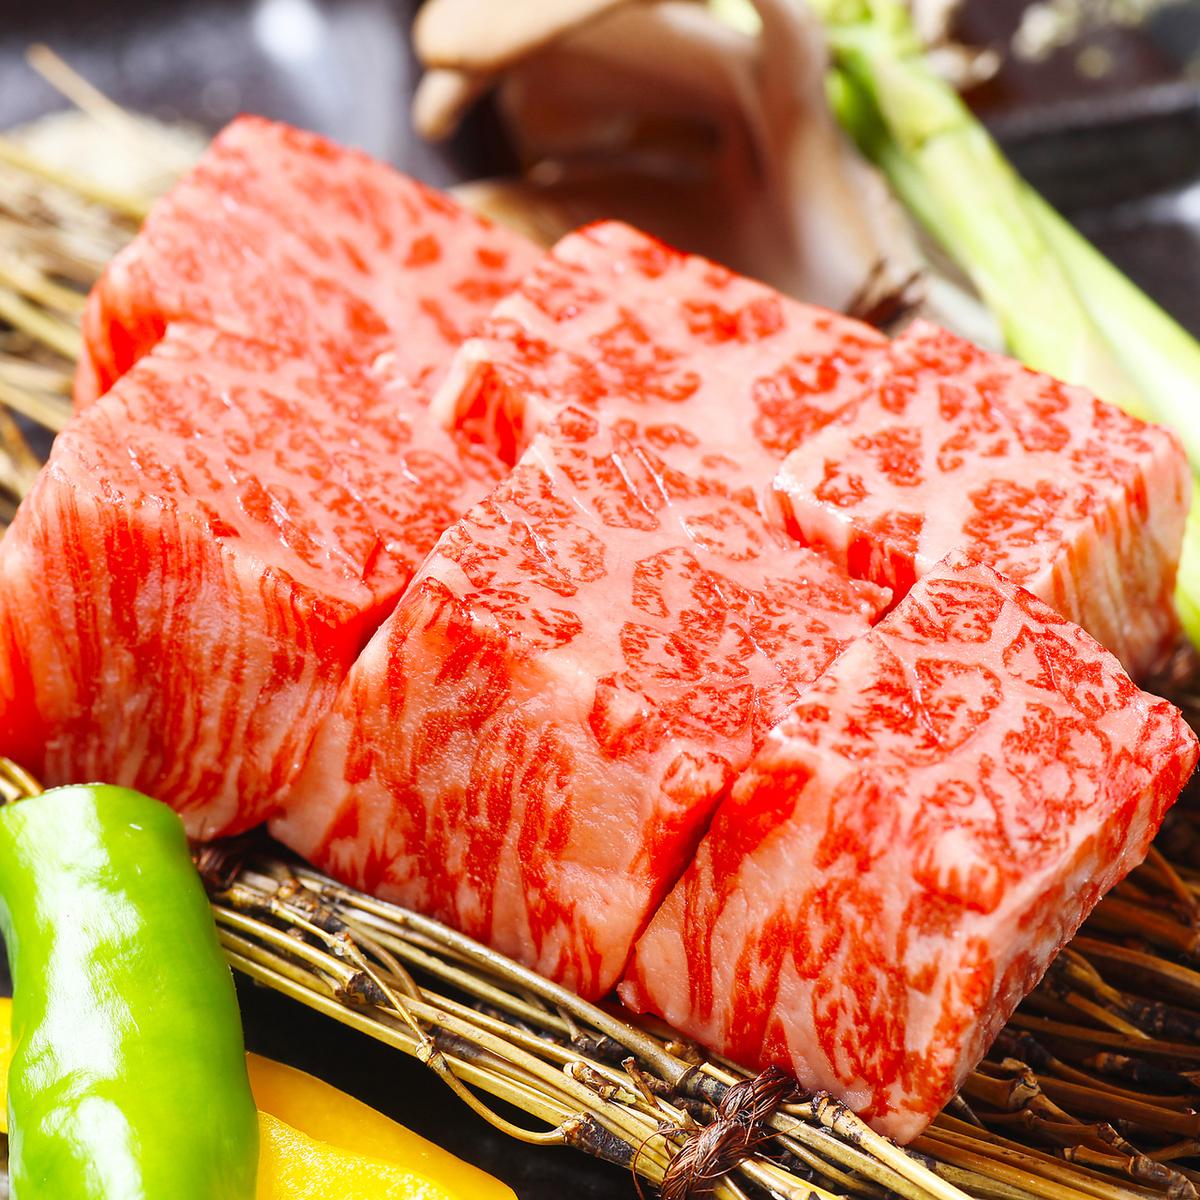 Kuroge Wagyu beef sirloin from Hokkaido